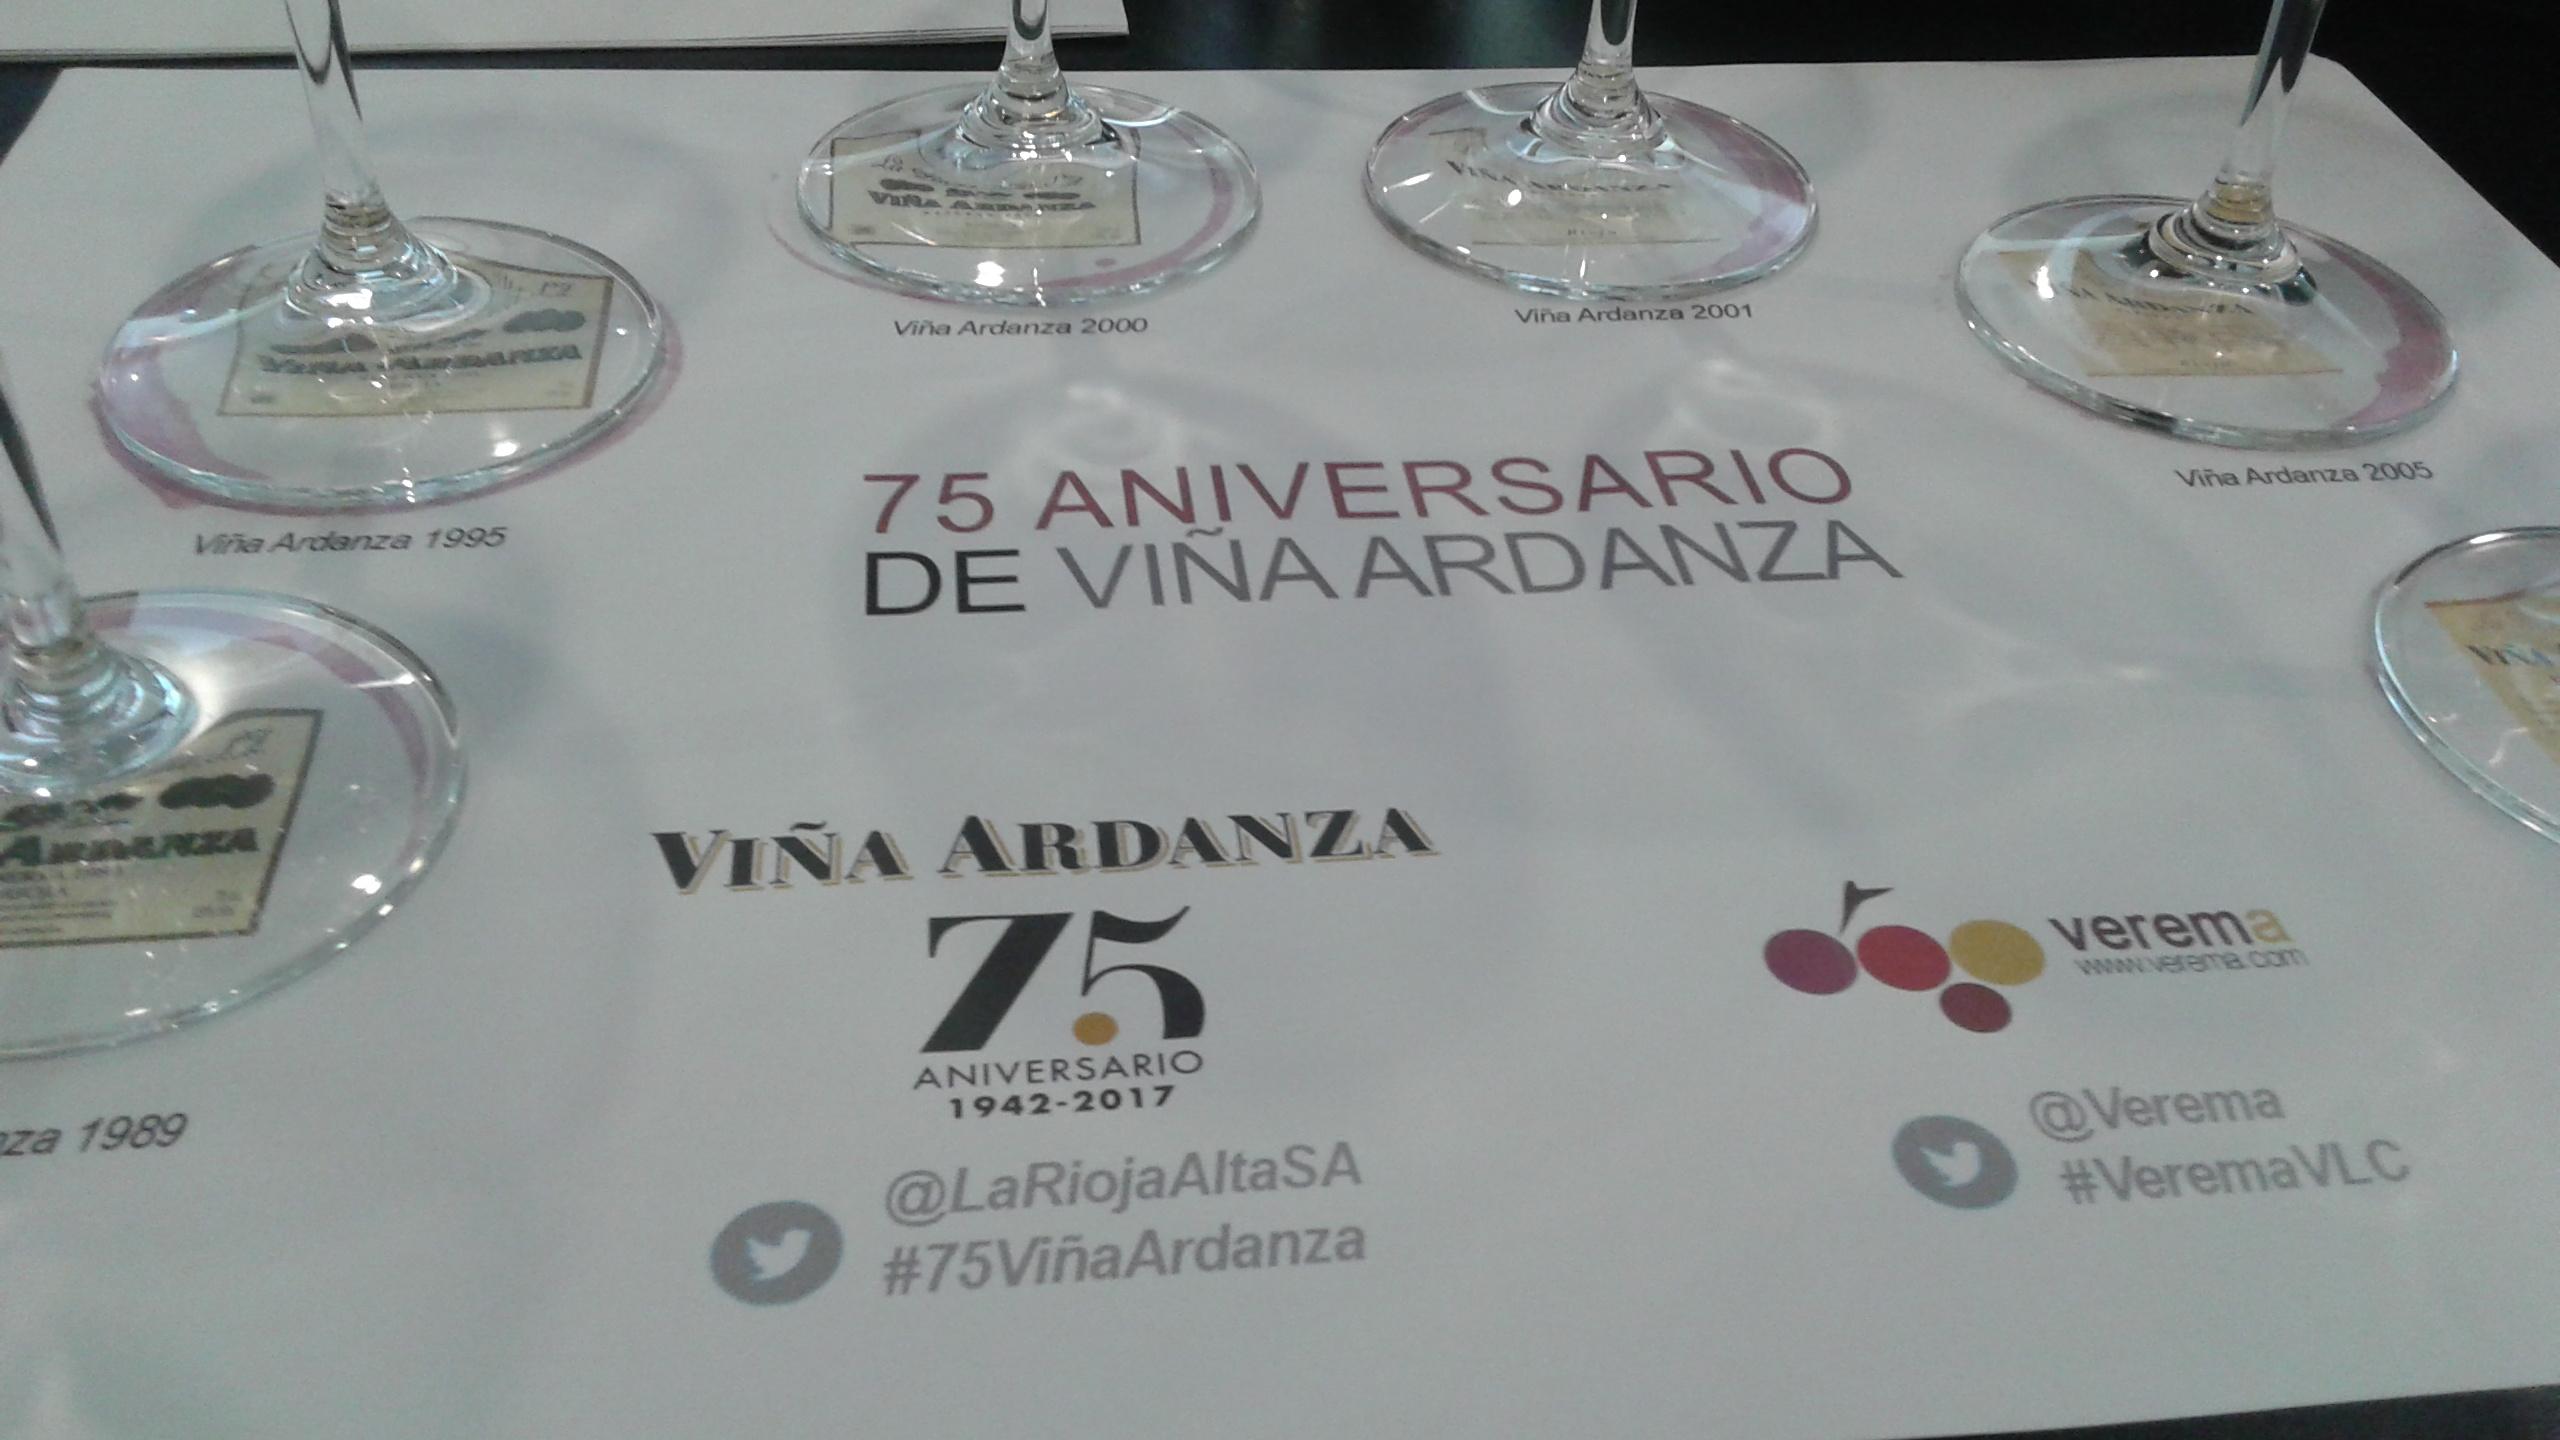 Cata de Rioja Alta